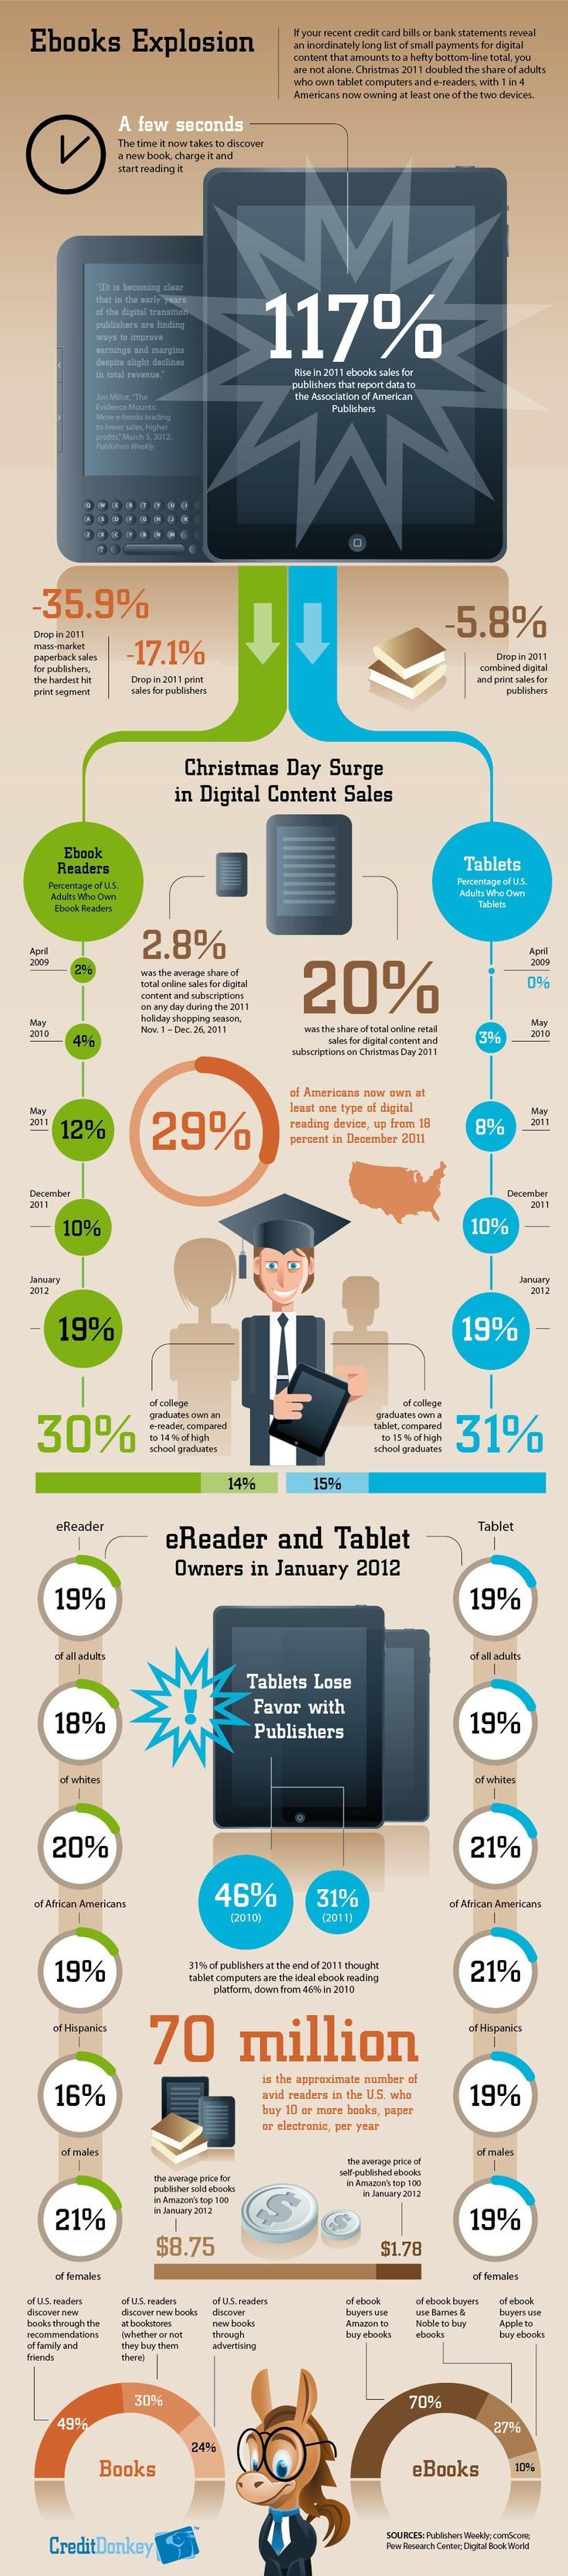 #Ebook Explosion [#Infographic]